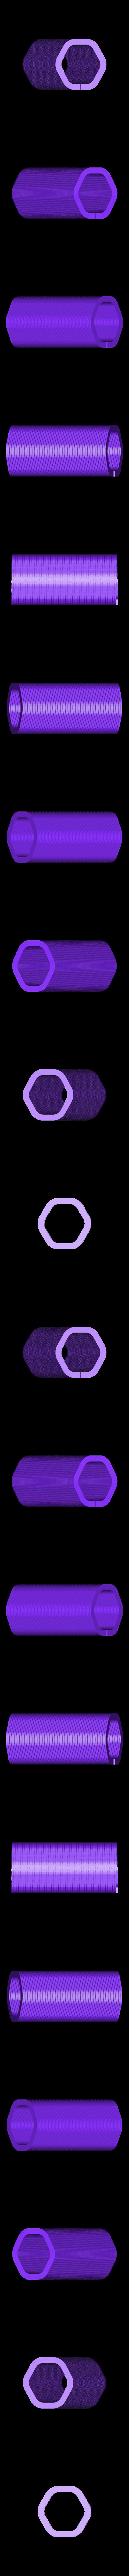 OctagonSlinky.stl Download free STL file Slinkies • Template to 3D print, Ristrorg